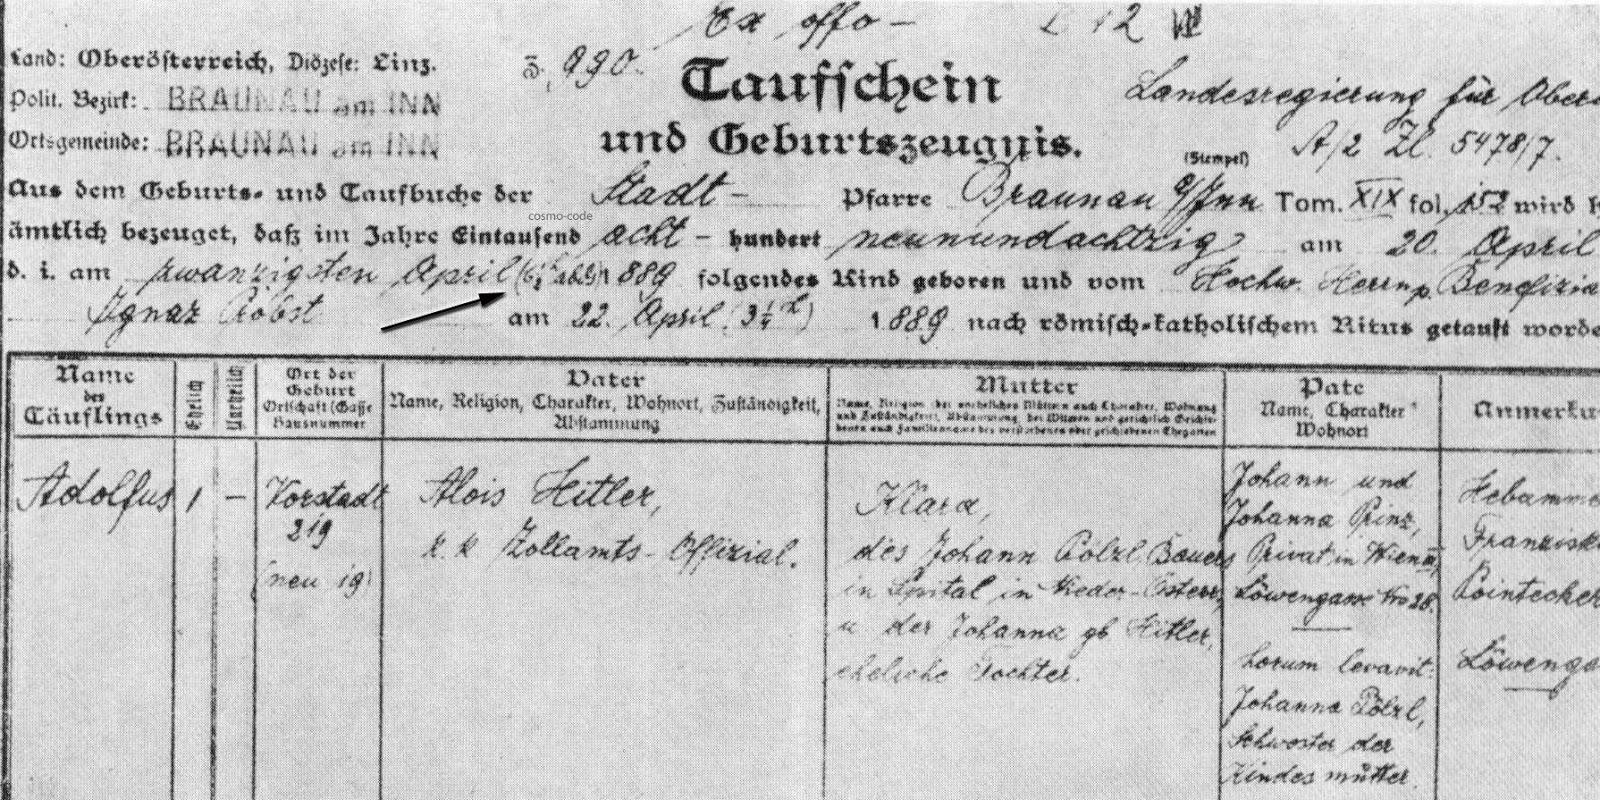 Adolf hitler date of birth